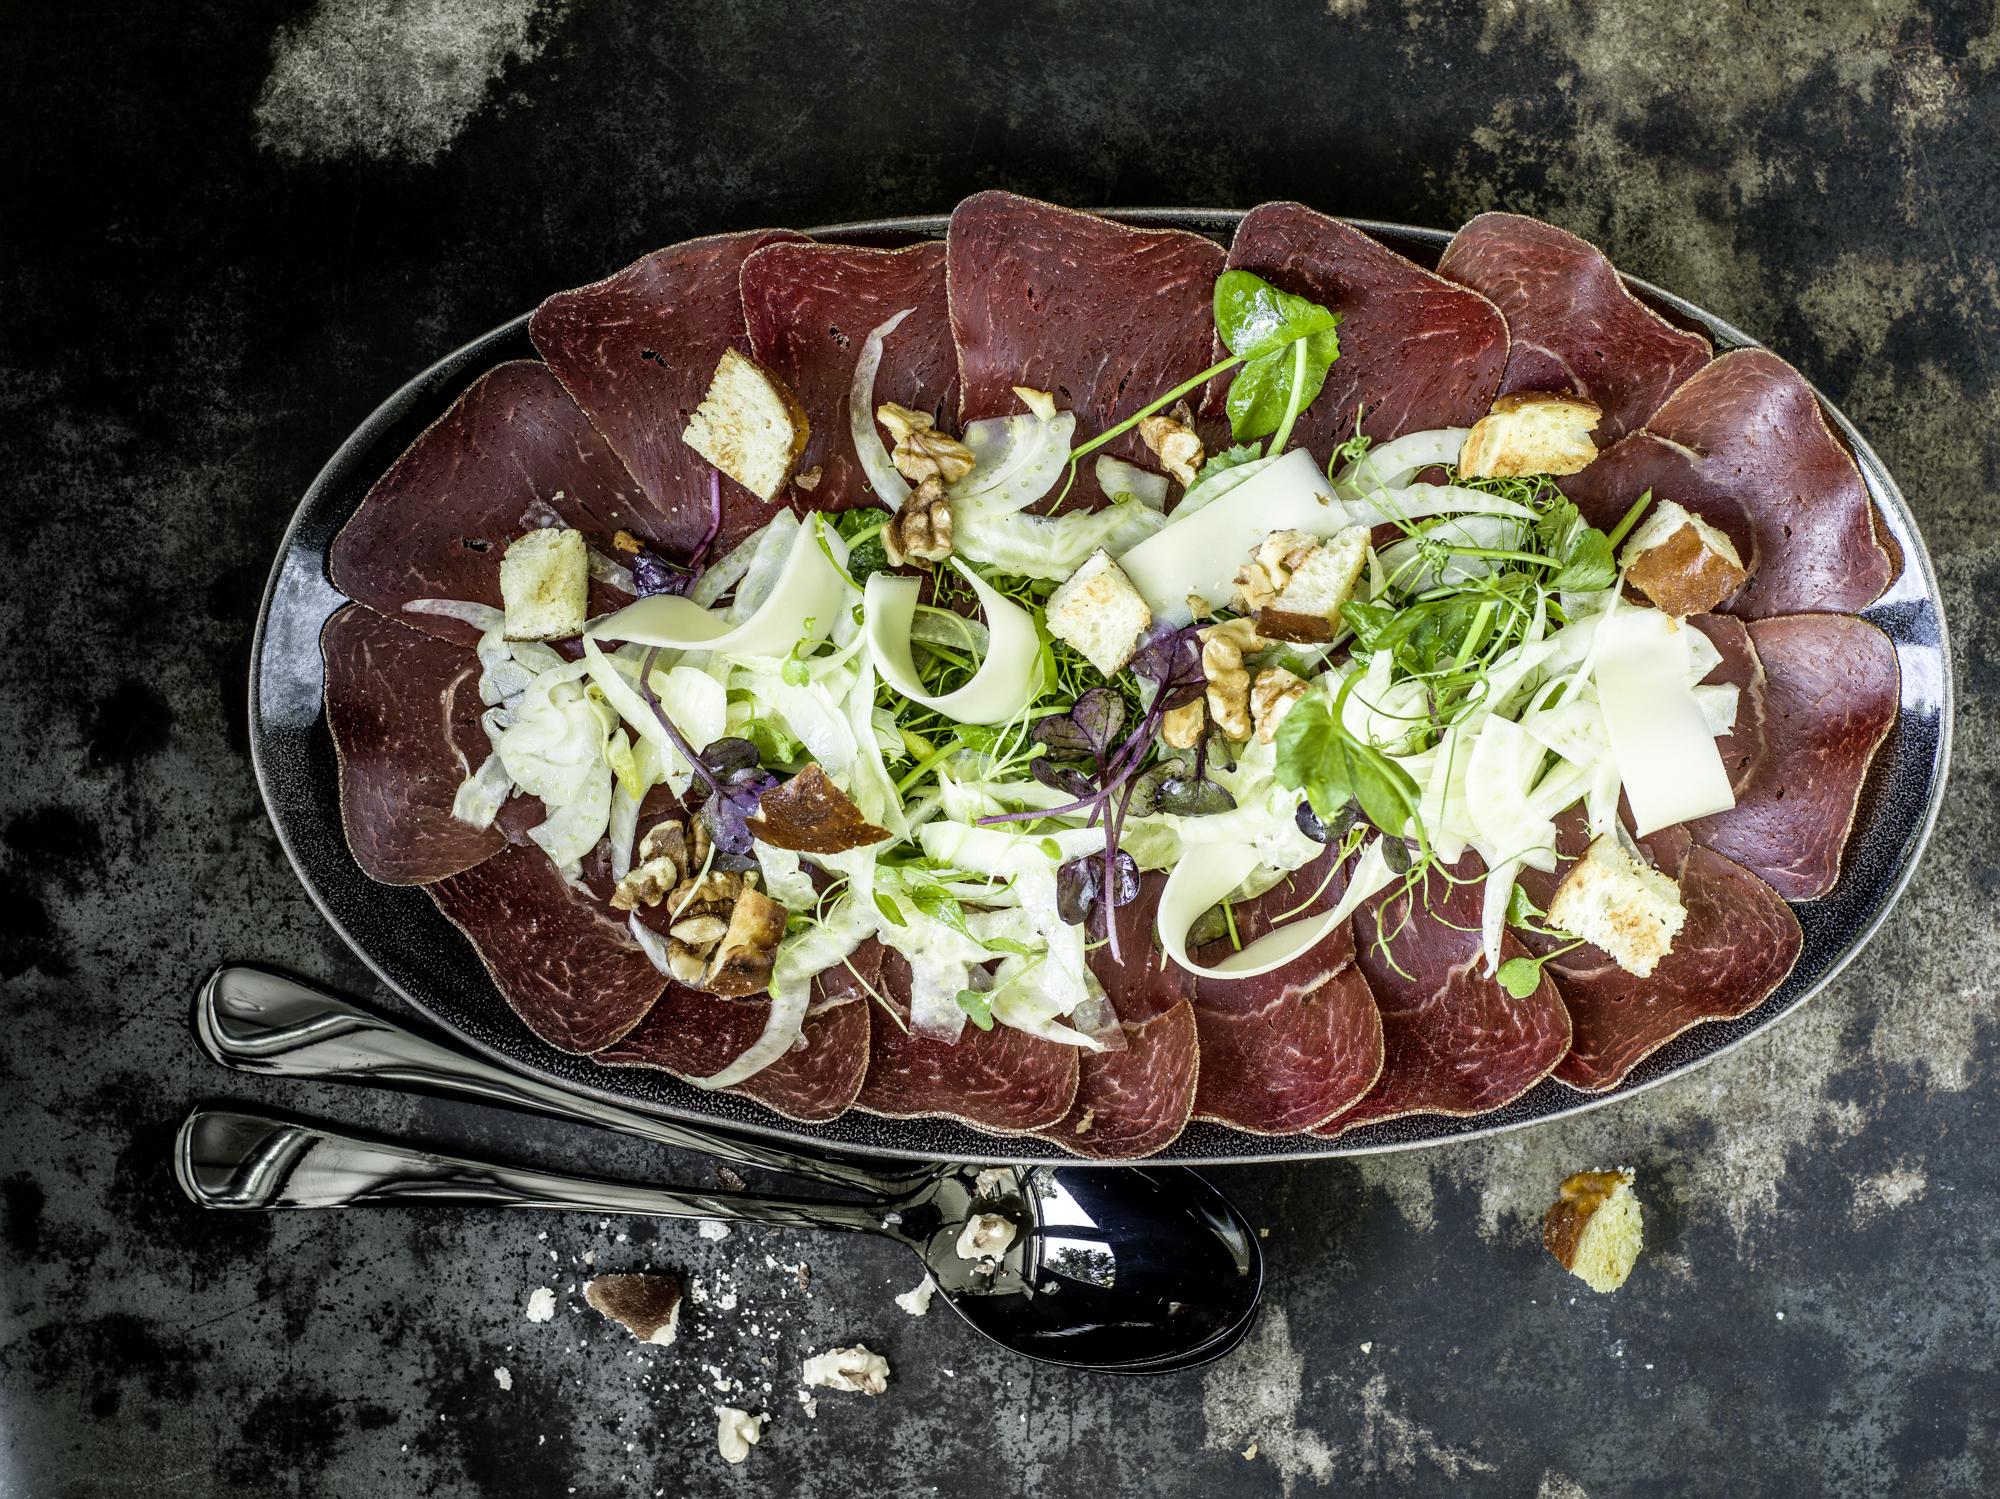 Food-Fotografie Meatlove, Stefan Schmidlin Fotograf Basel; Bild 28.jpg